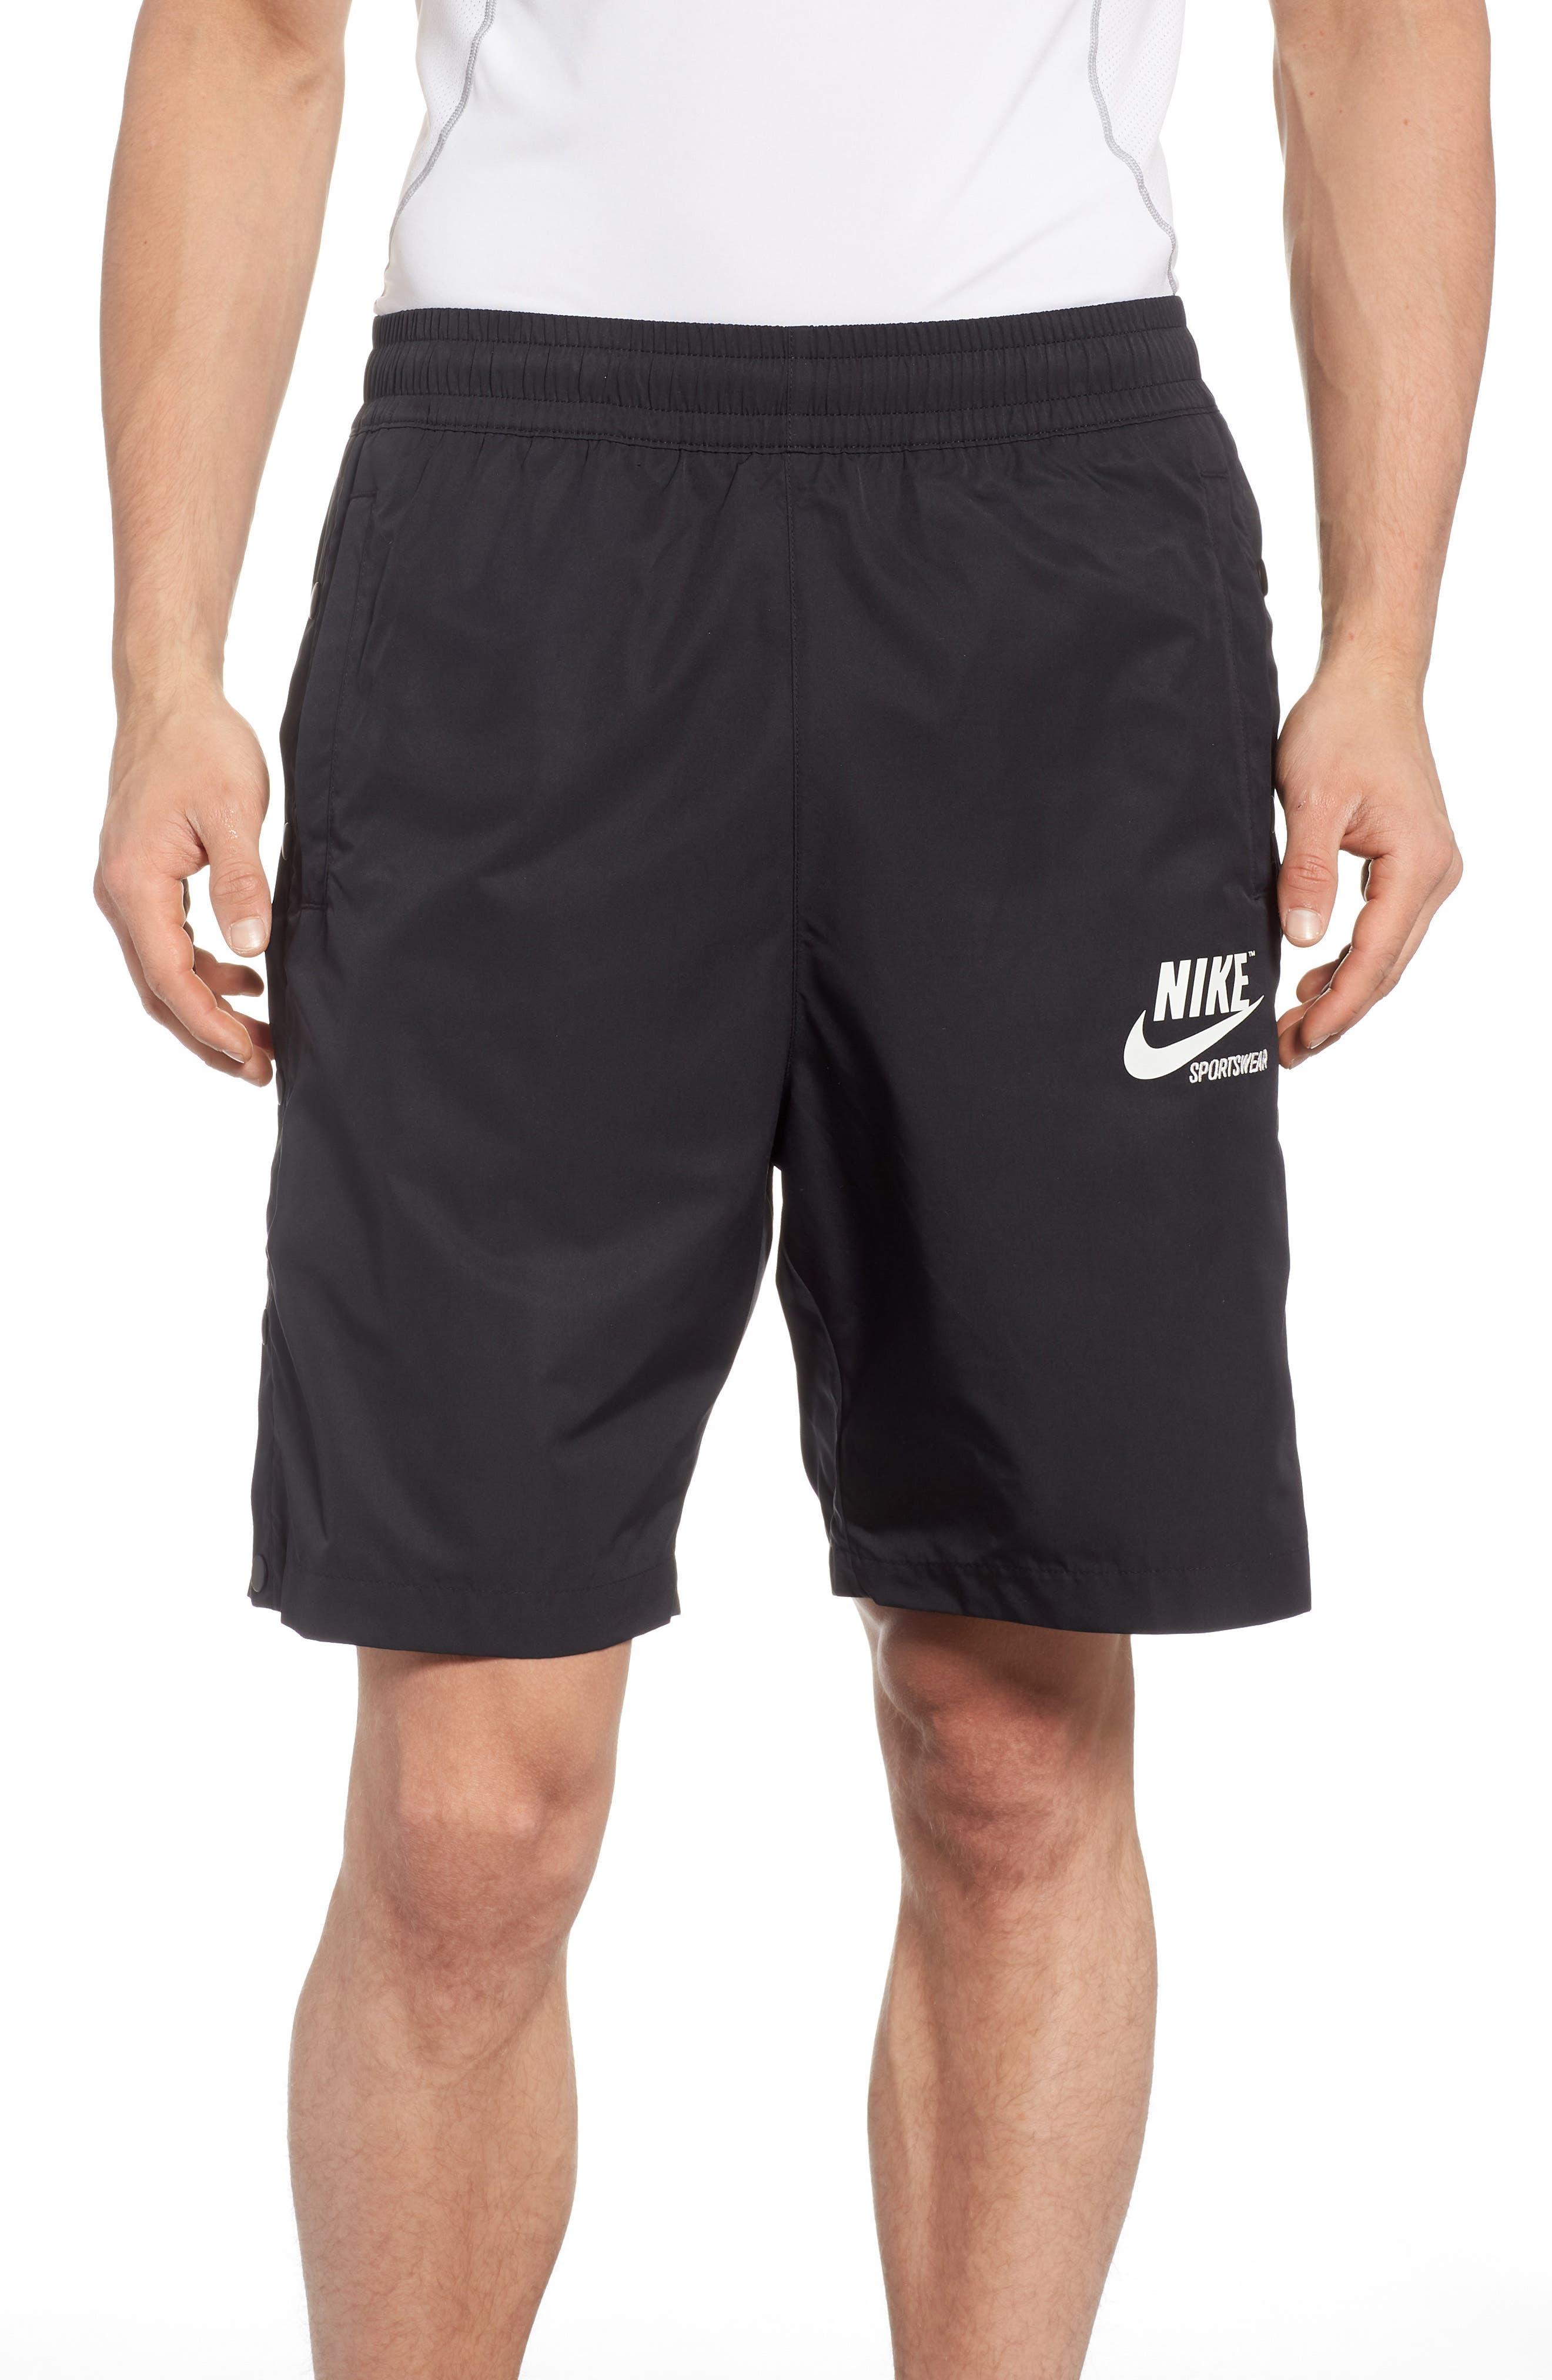 Nike Nsw Archive Shorts, Black